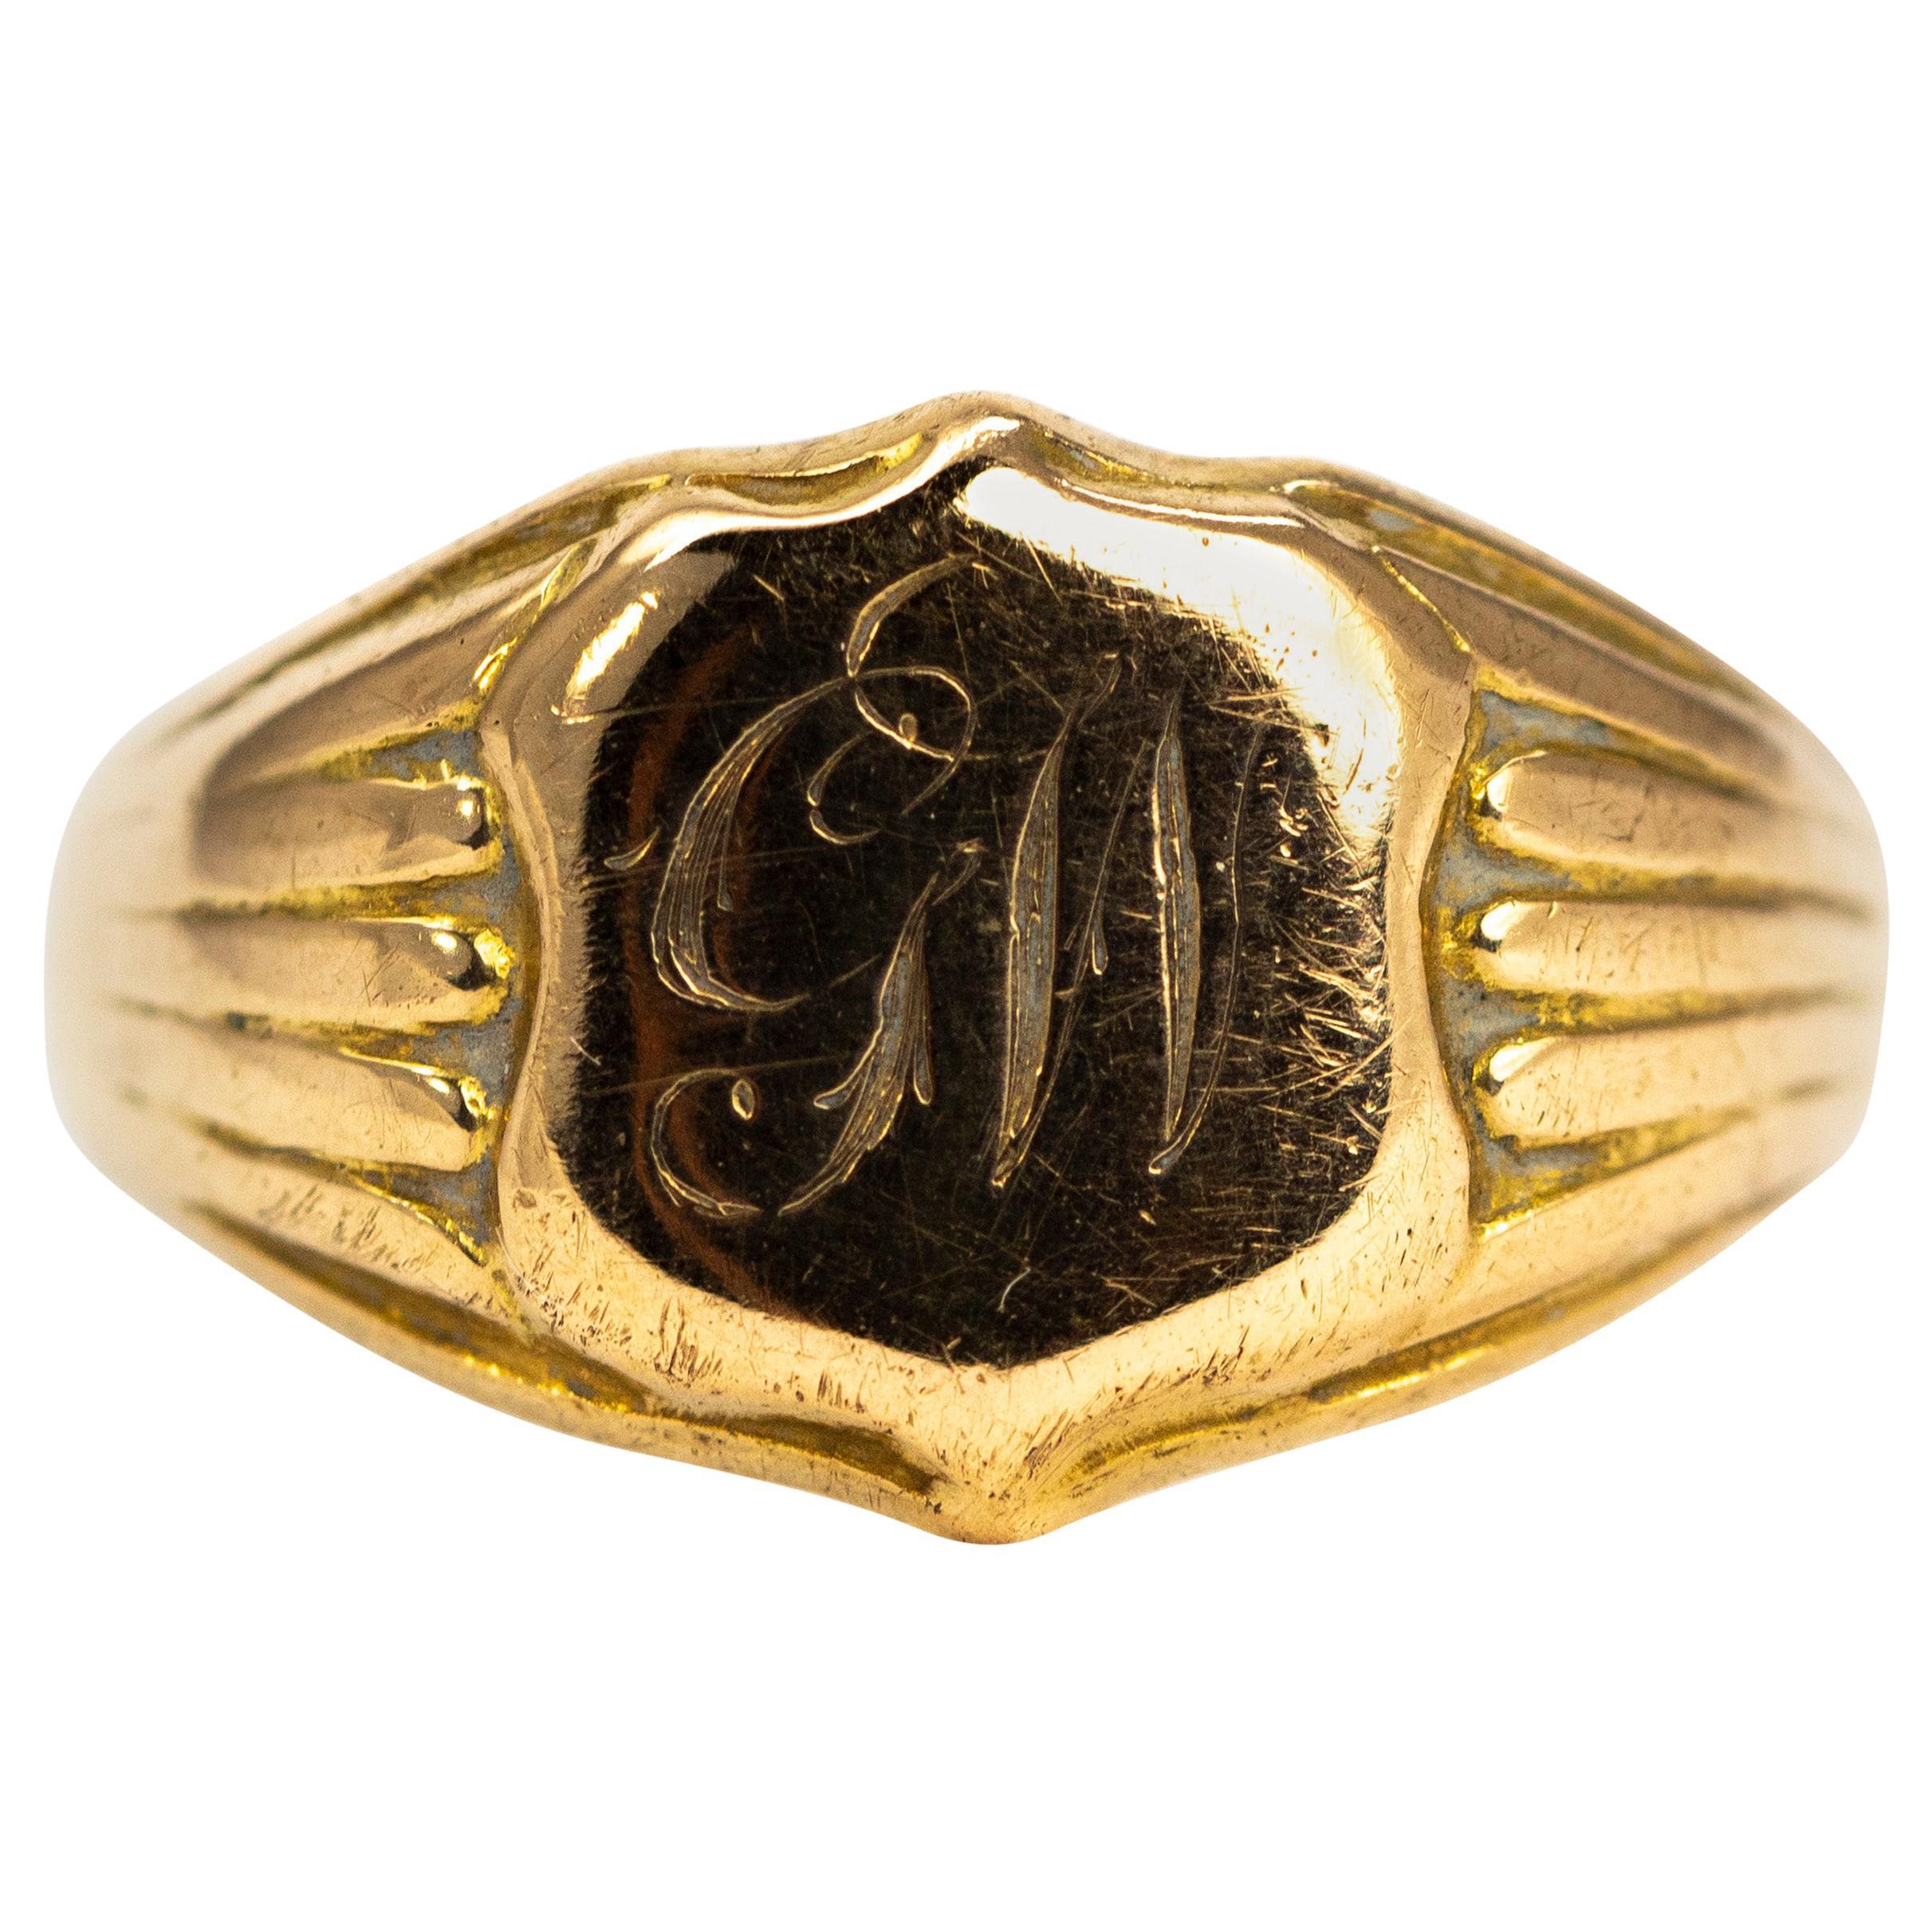 Victorian 18 Carat Gold Signet Ring